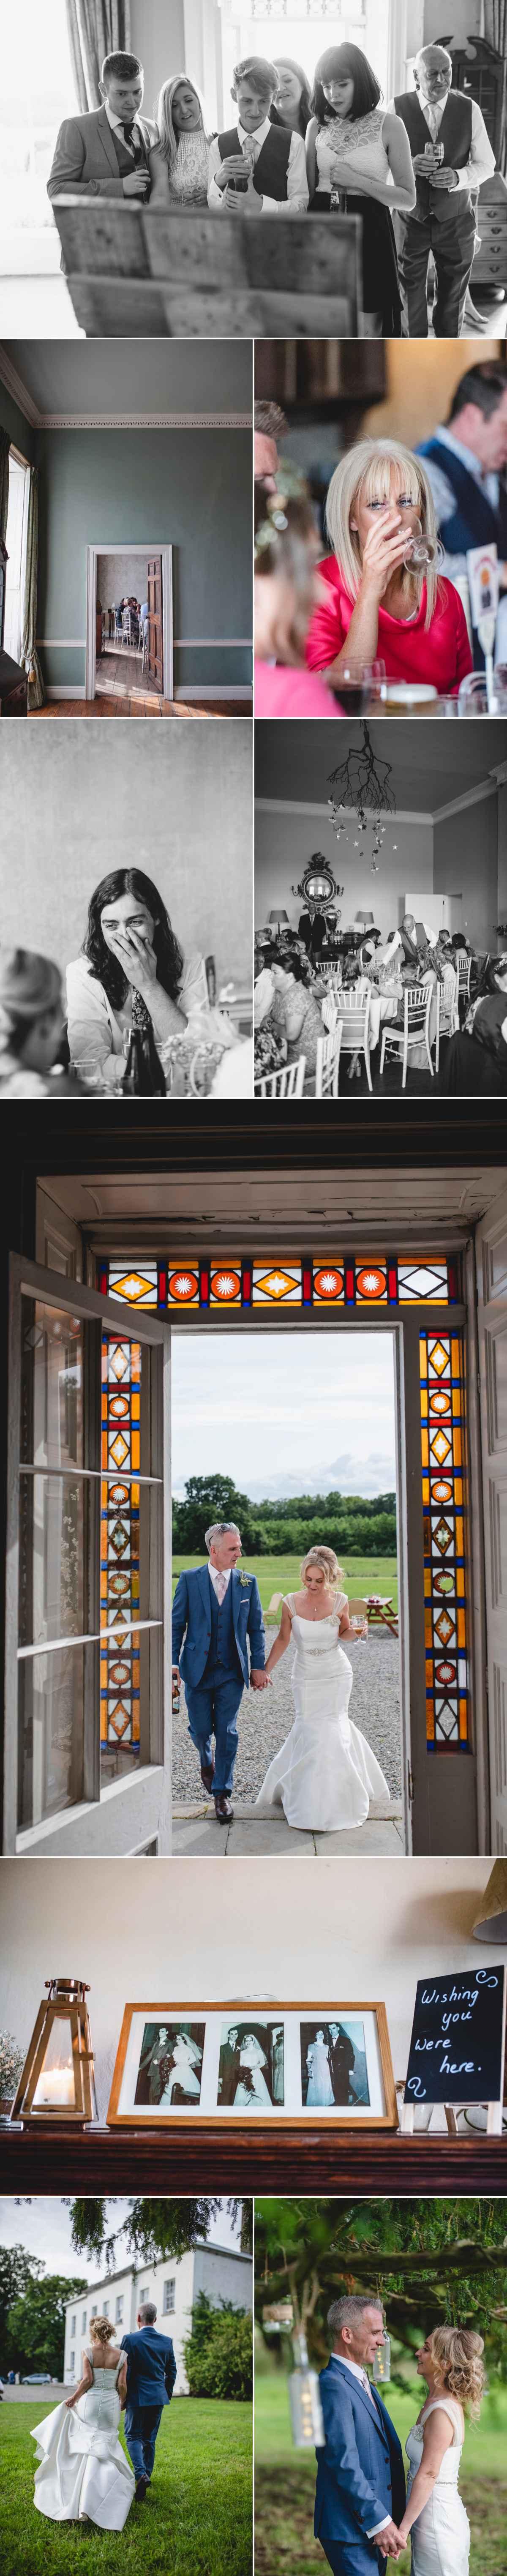 Rustic Wedding Ireland Photographer 15.jpg